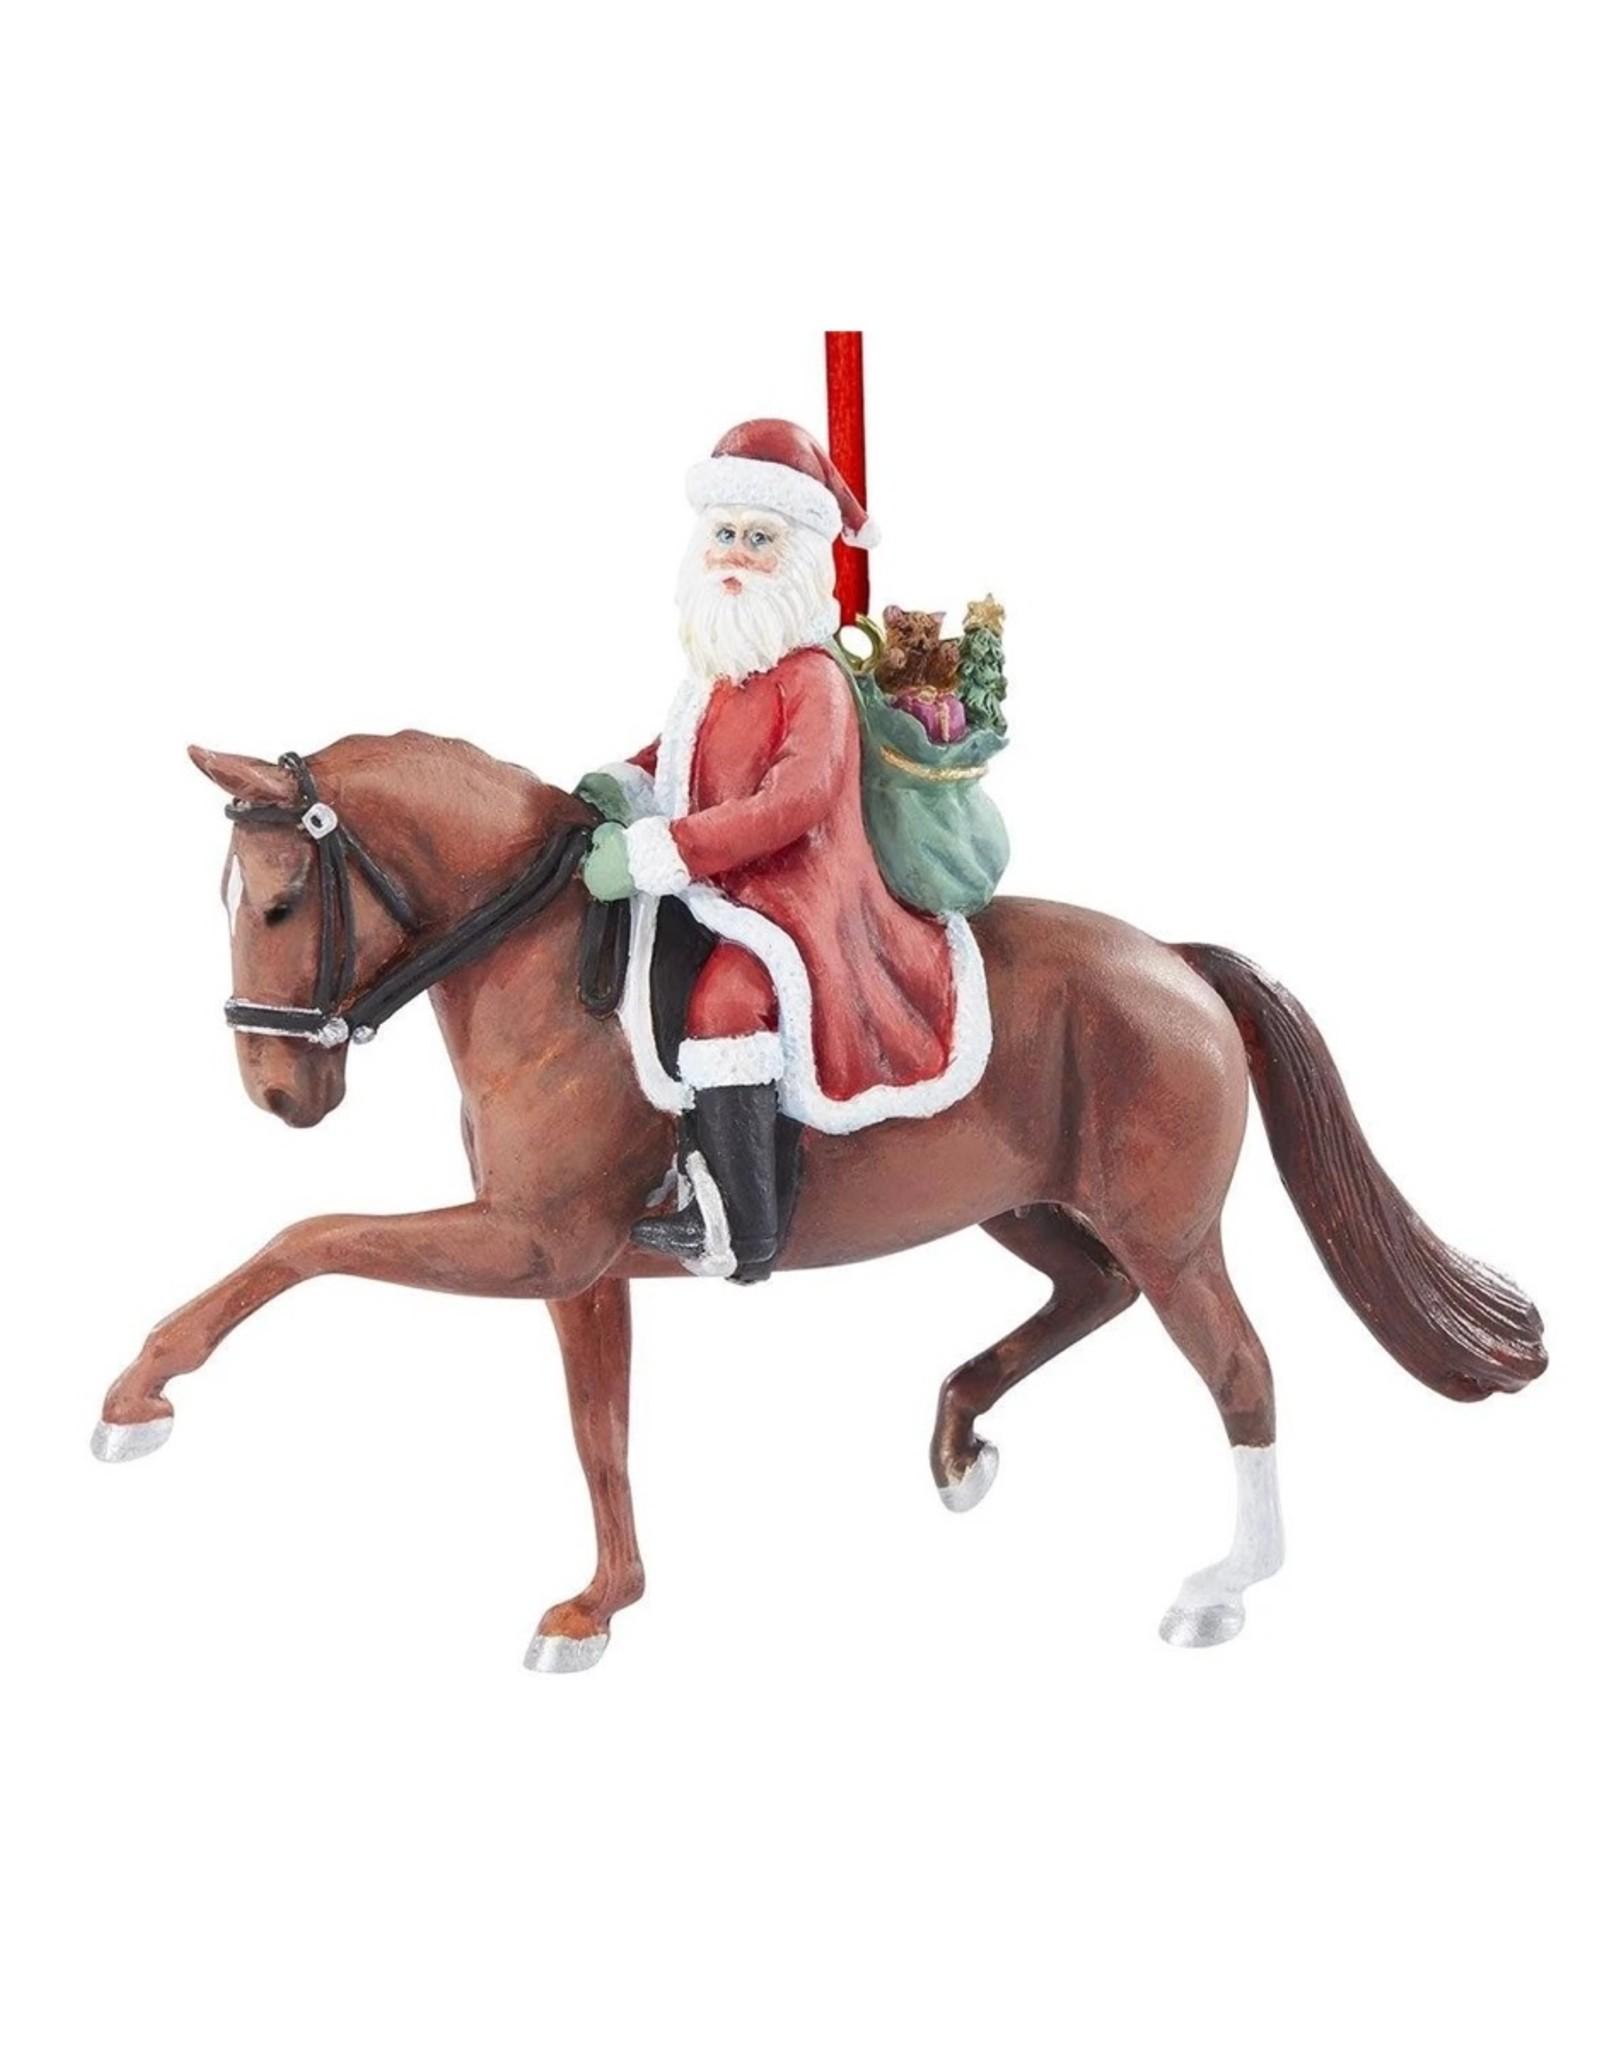 Breyer Dressage Santa 2020 Ornament